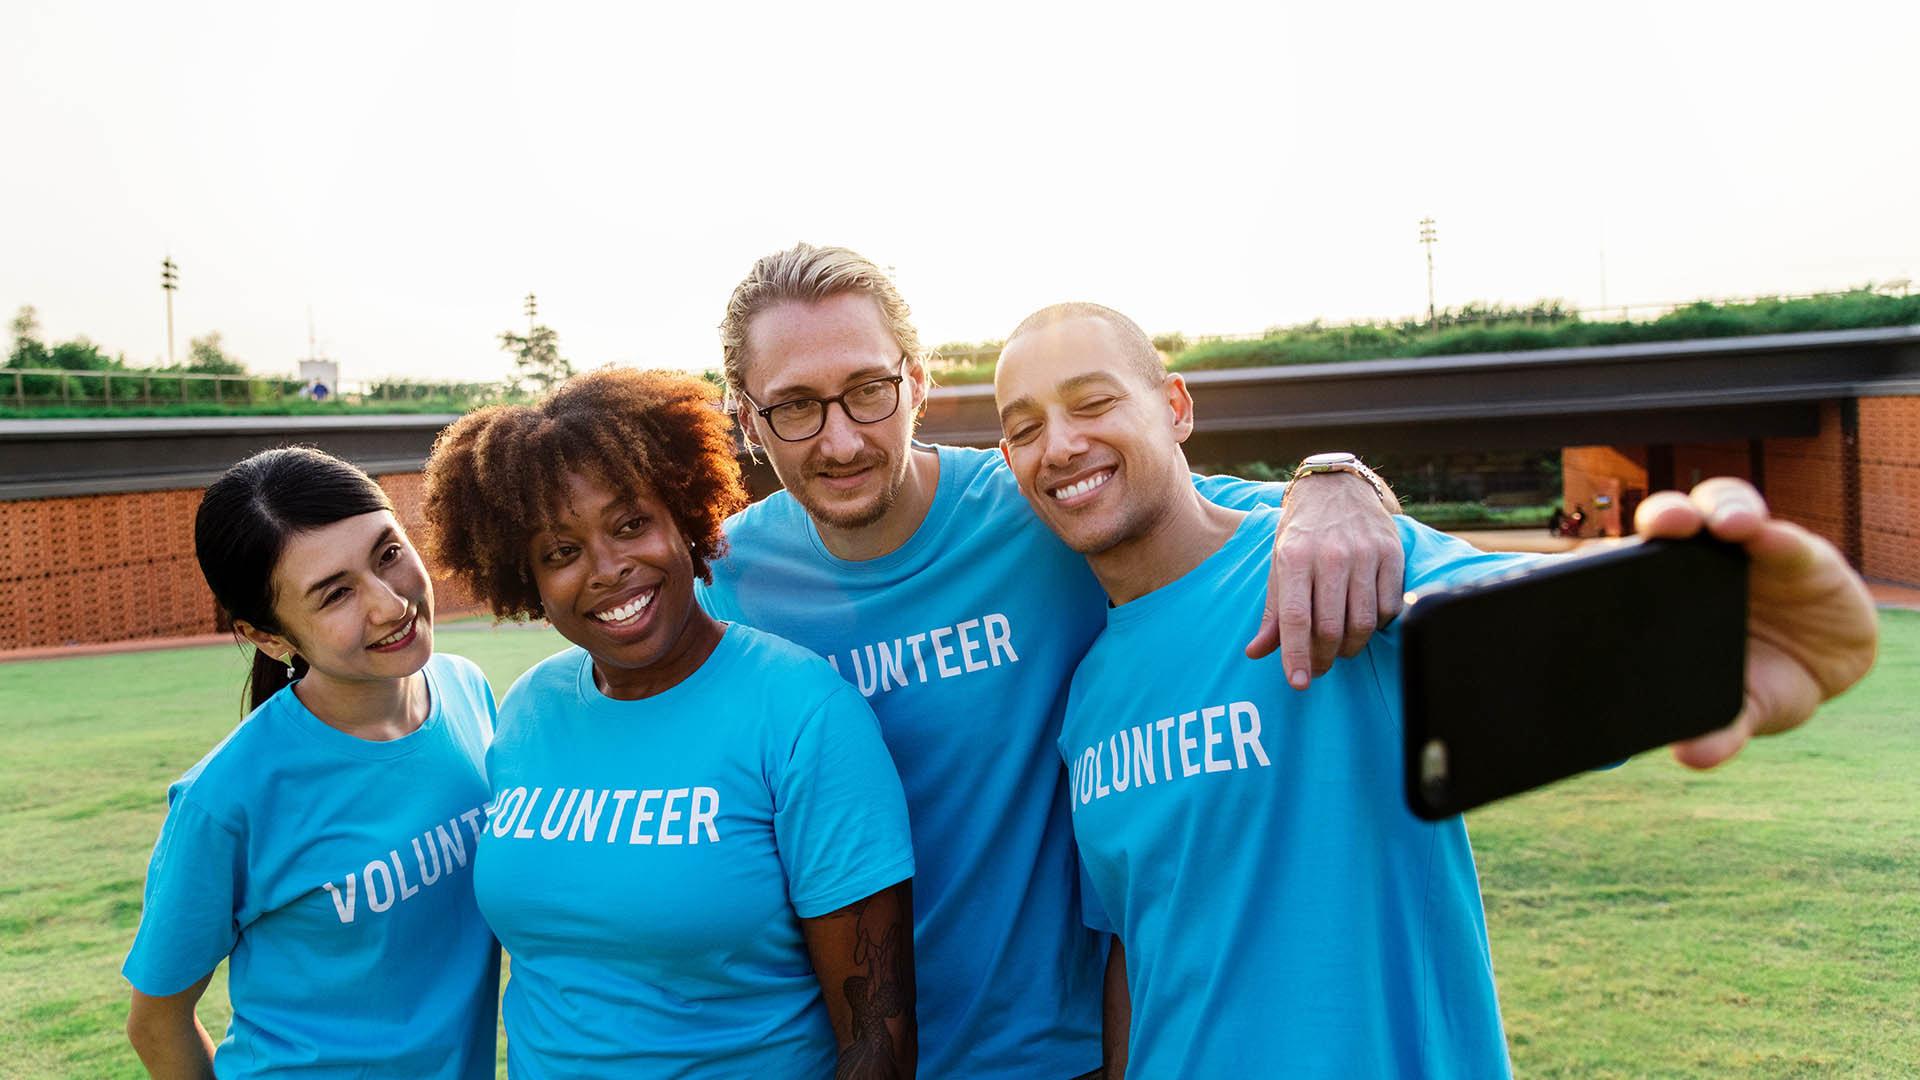 13 creative marketing ideas for nonprofits_featured image